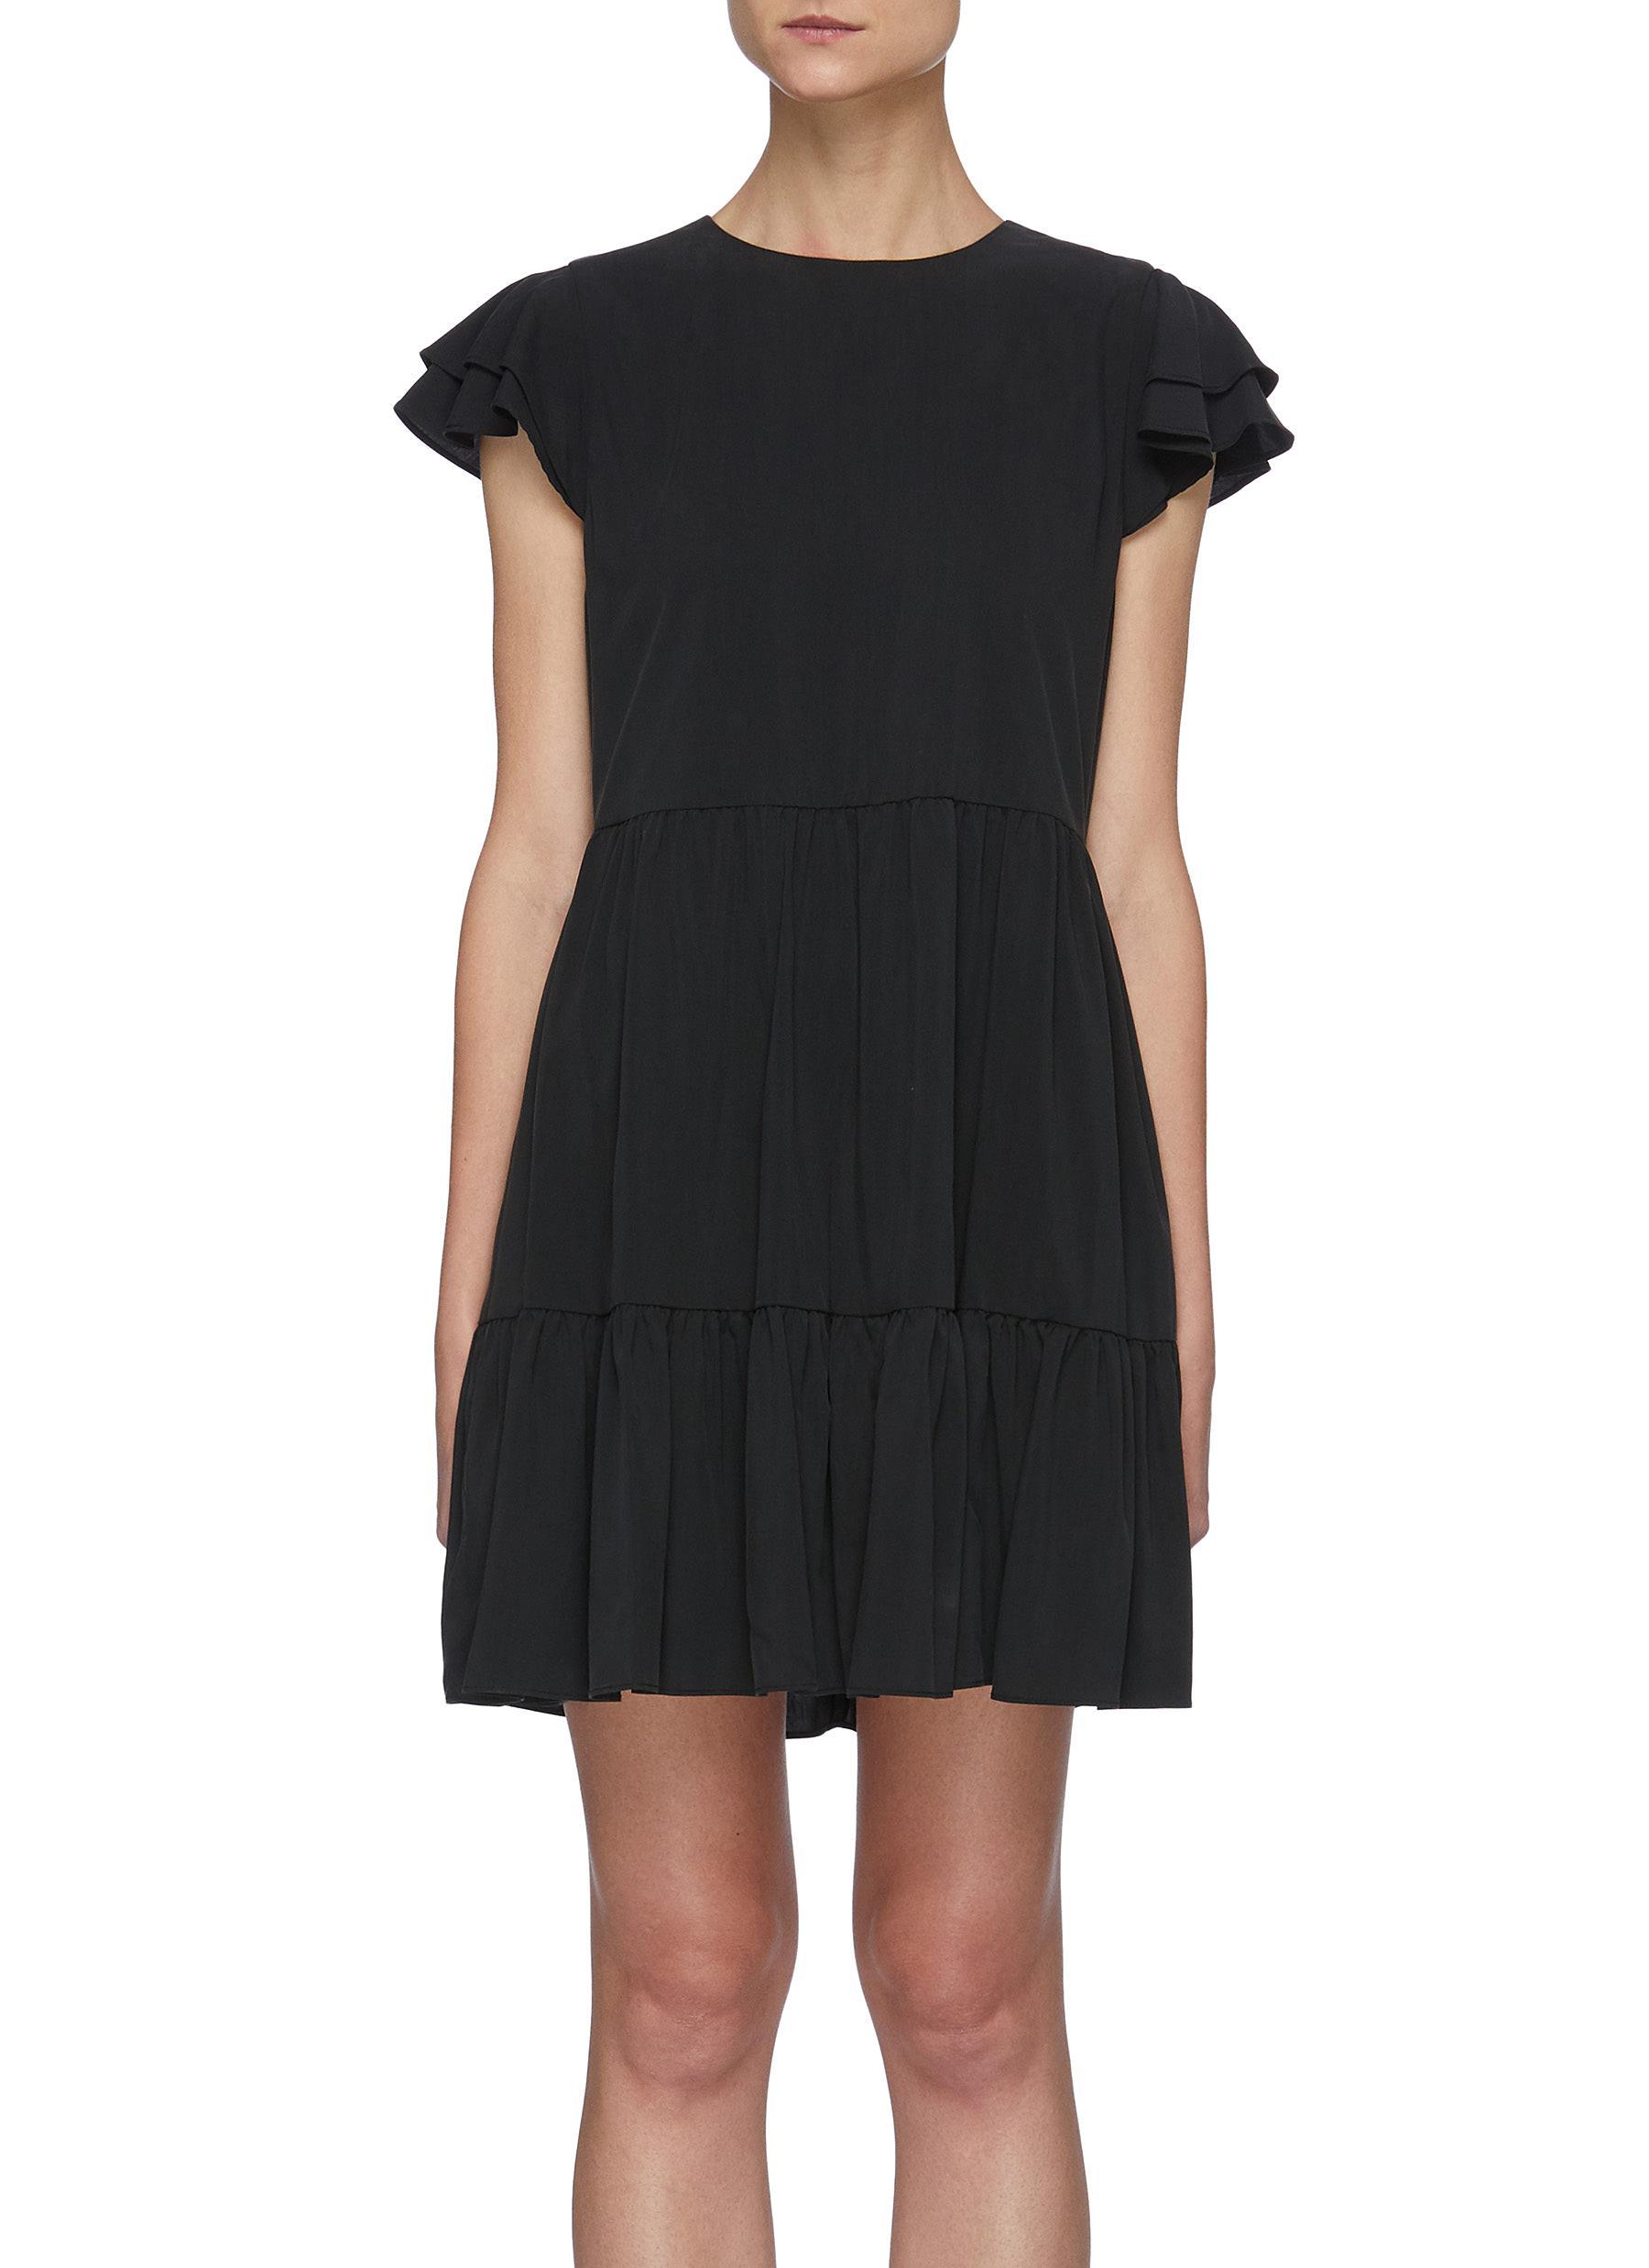 Demi' flutter sleeve babydoll dress - ALICE + OLIVIA - Modalova